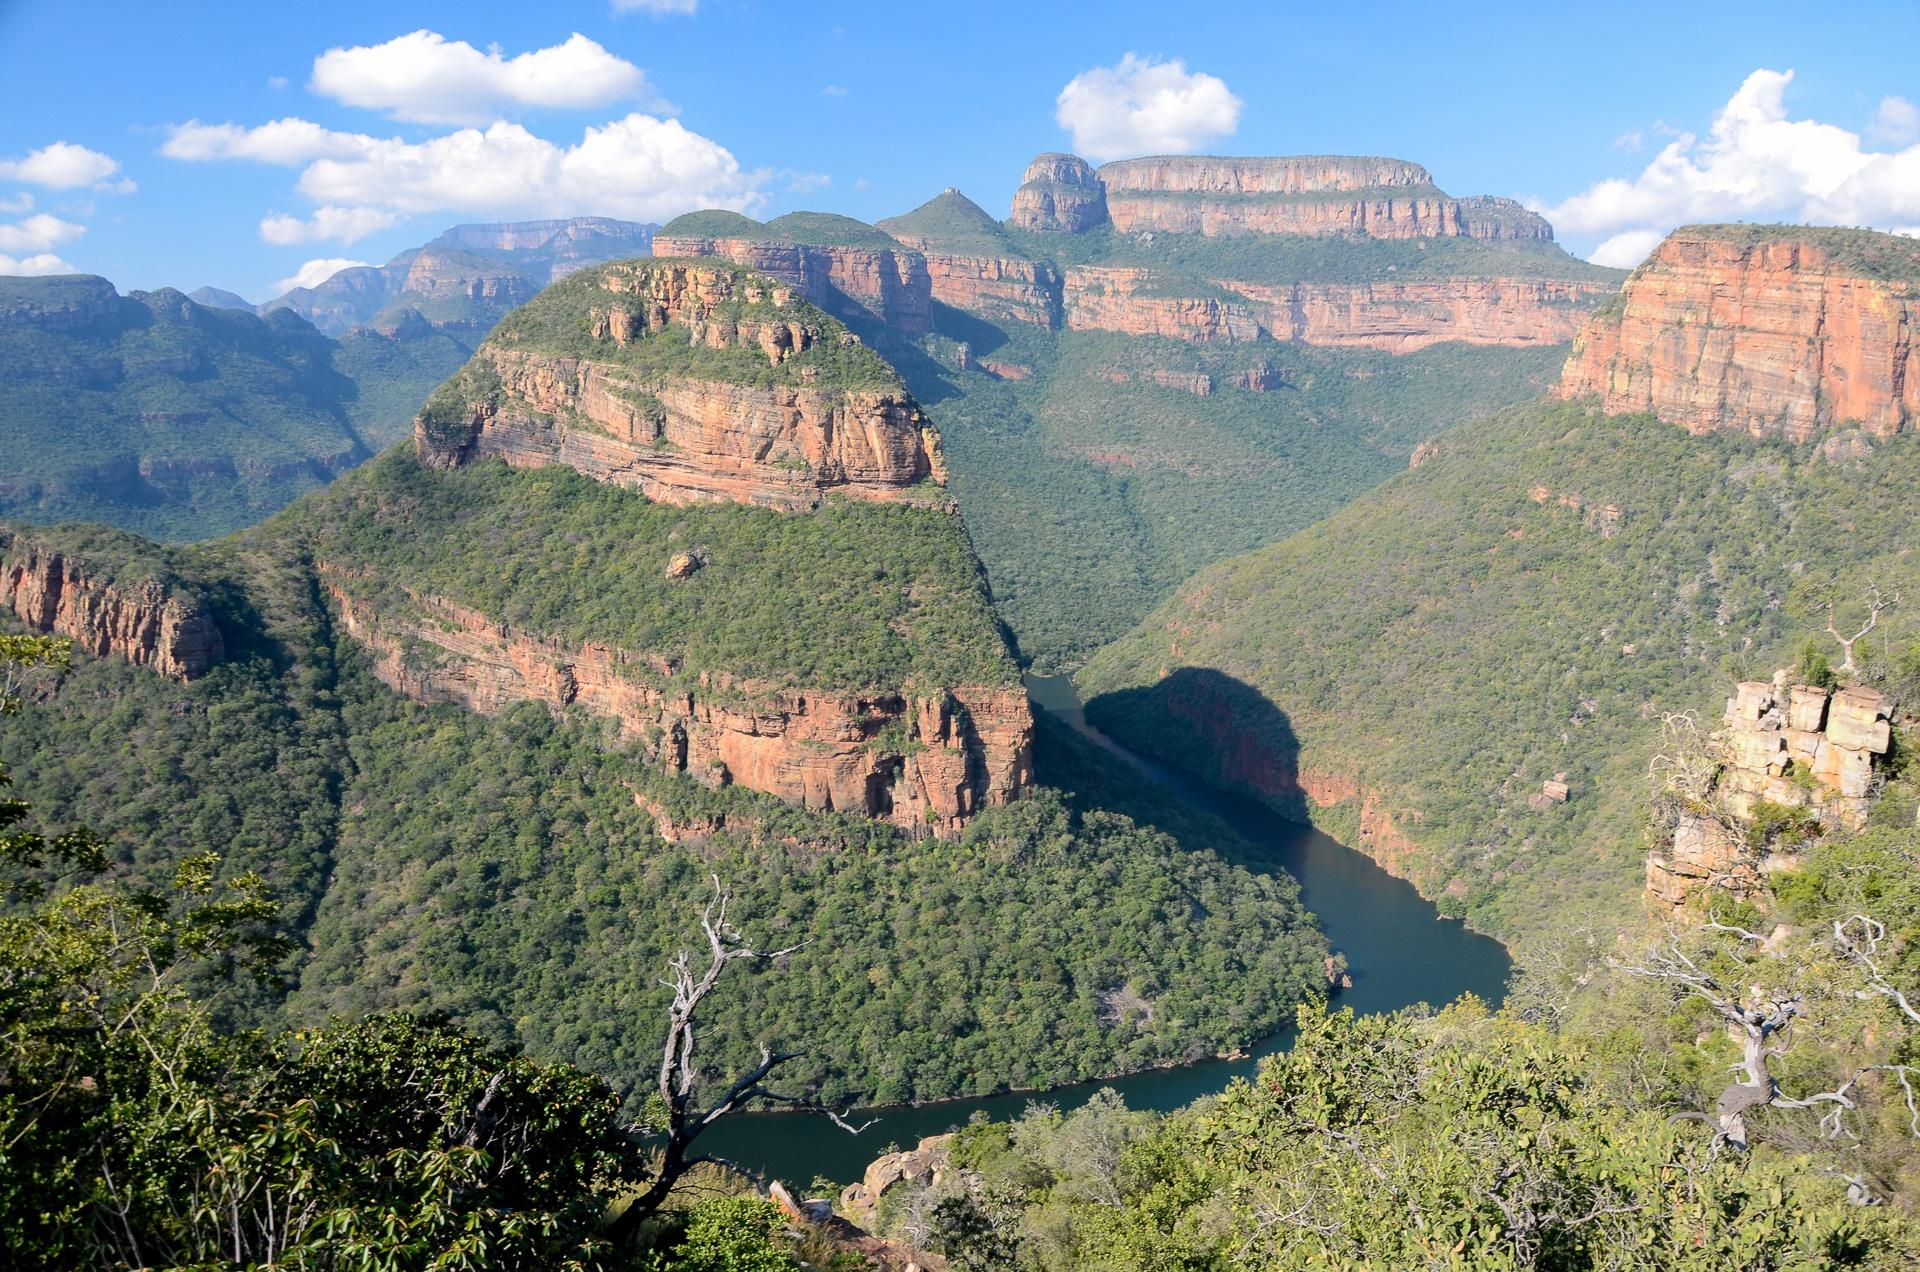 Rando face aux Three Rondavels, Blyde River Canyon